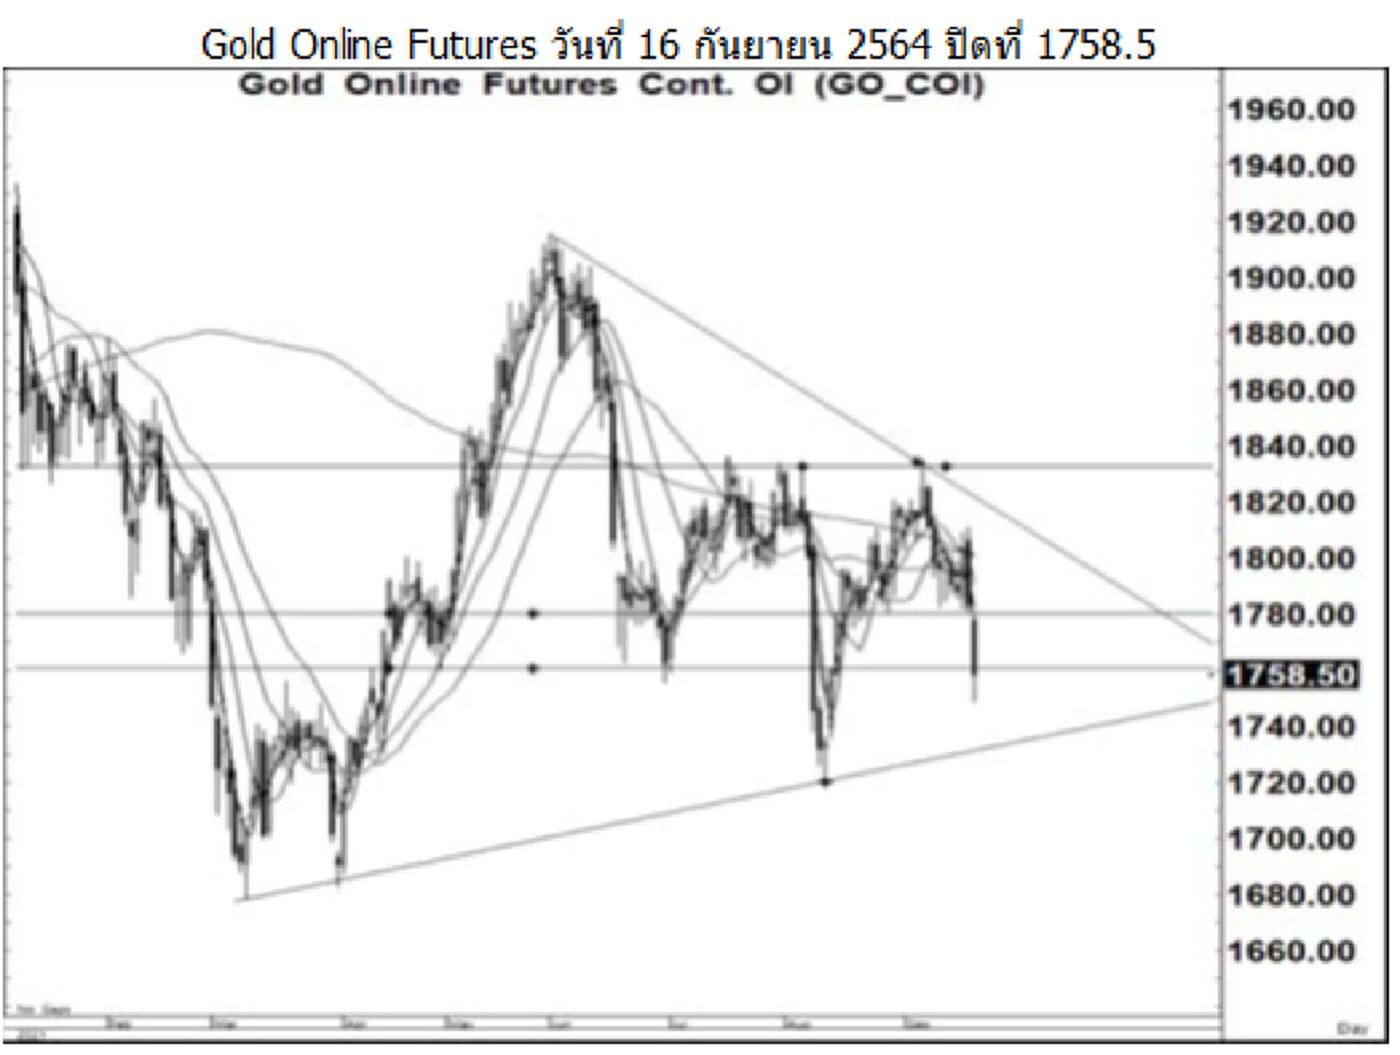 Daily Gold Futures (วันที่ 17 กันยายน 2564)